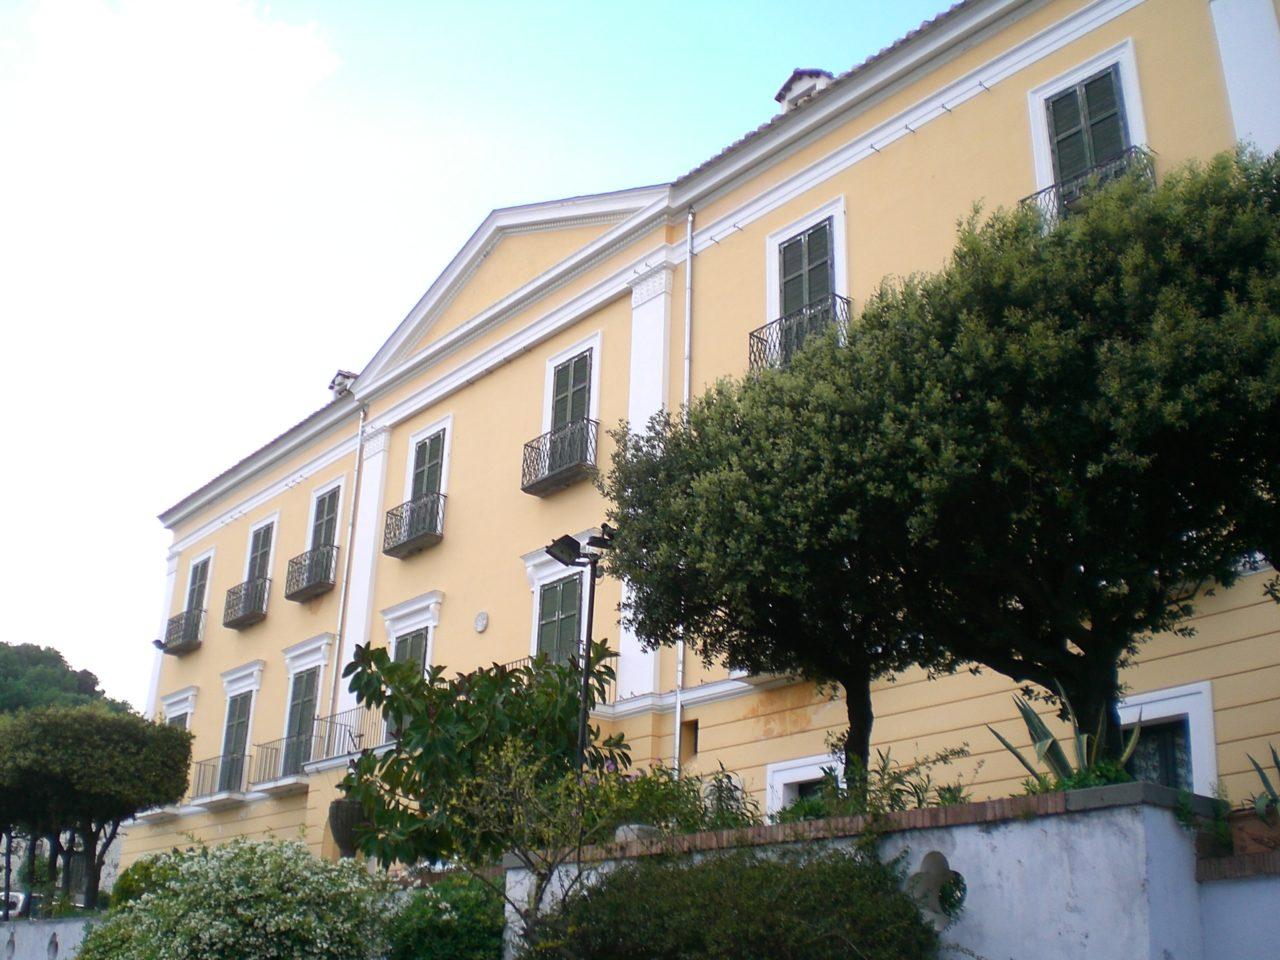 Villa Guariglia text